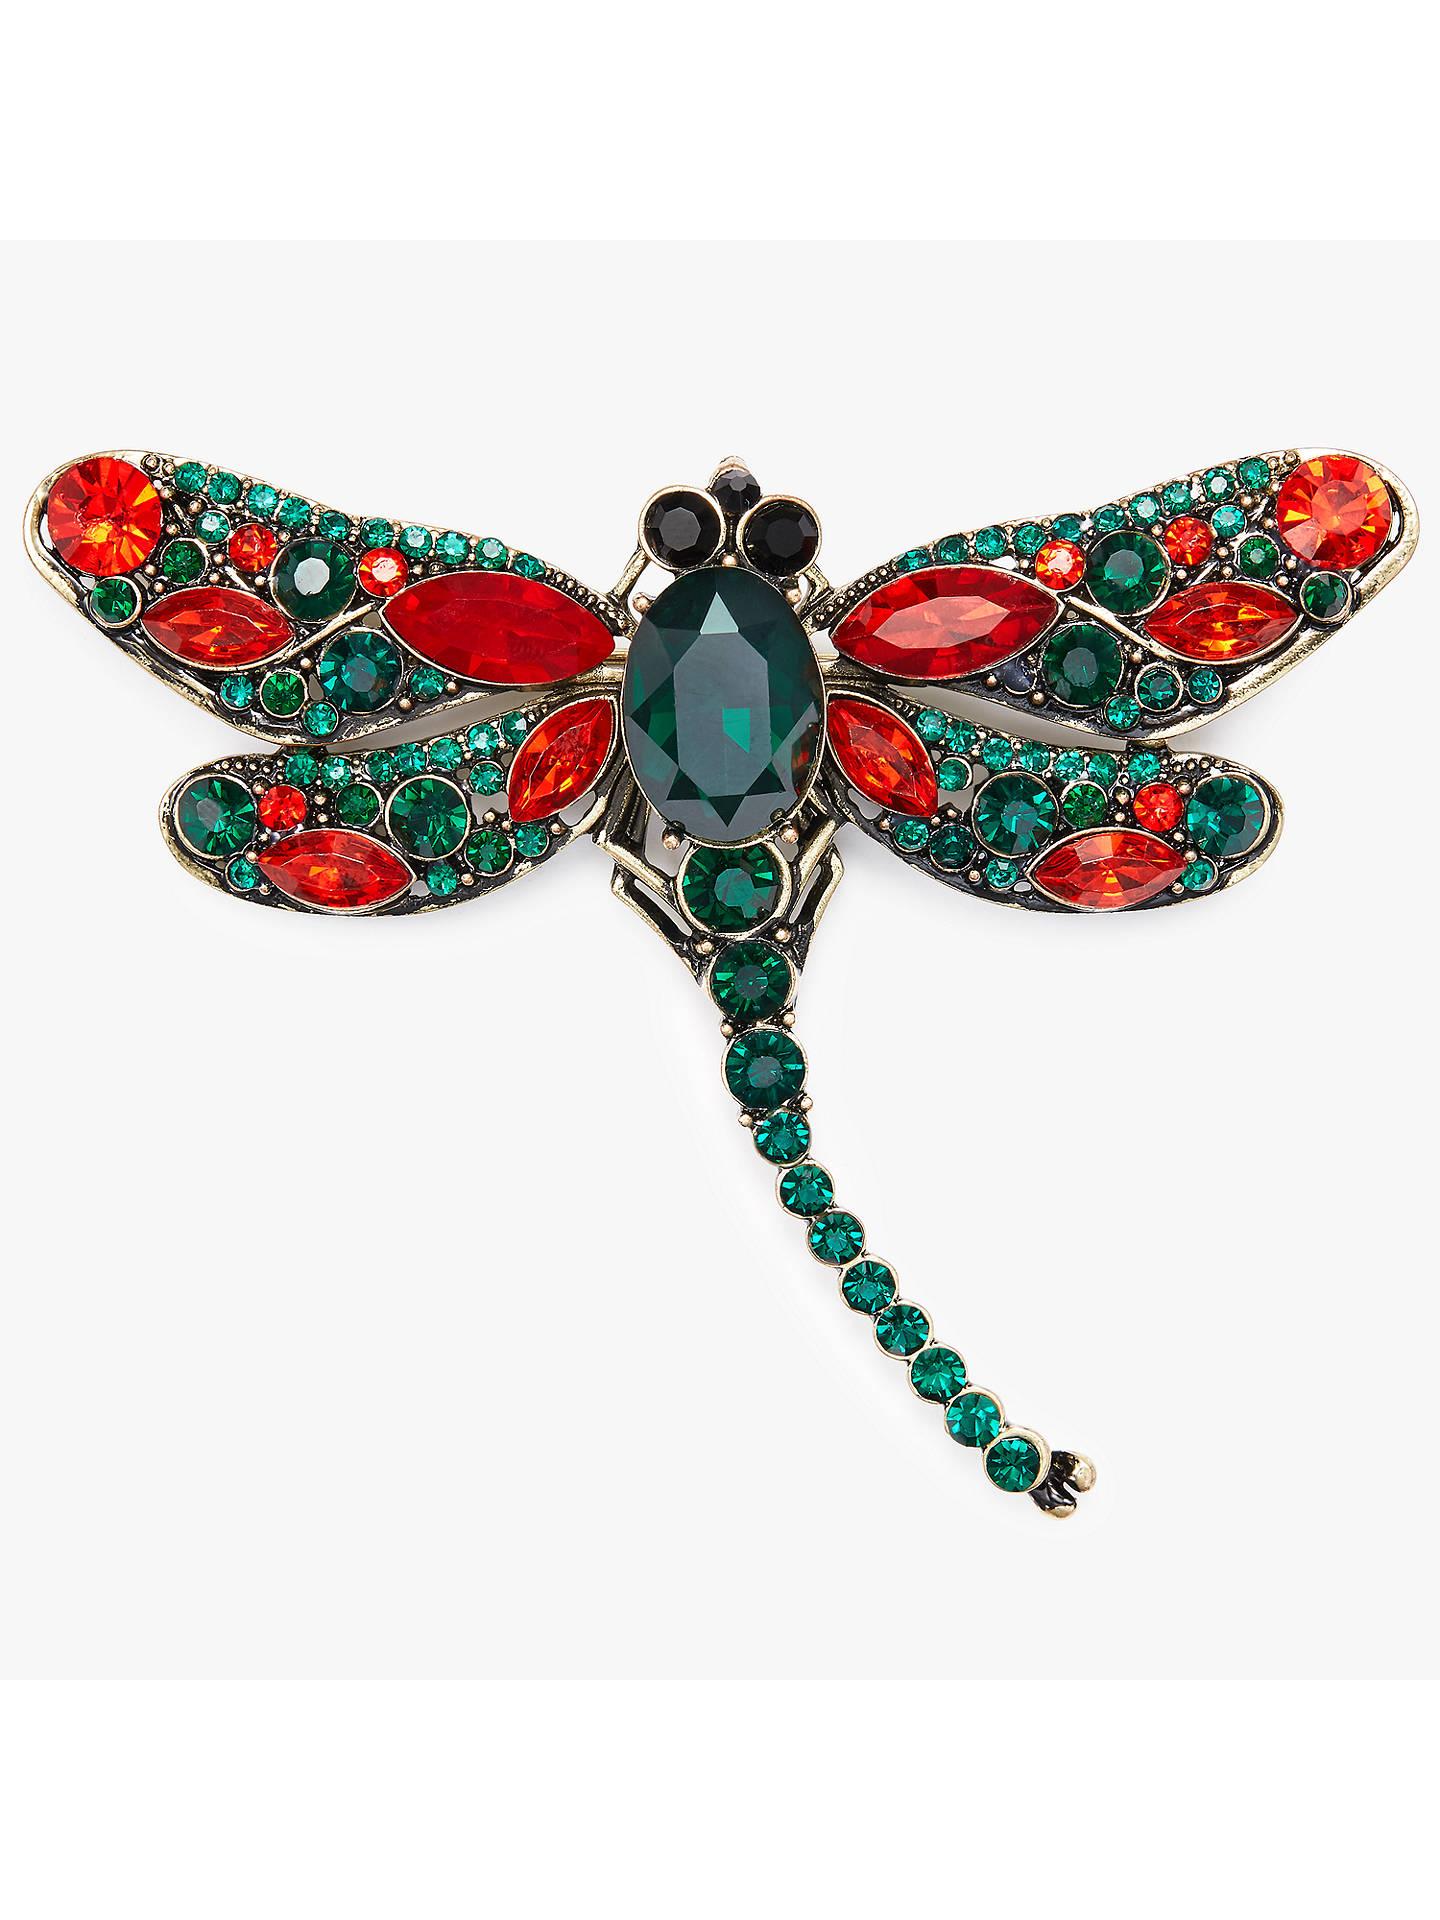 20a1a6dffde6e John Lewis Dragonfly Brooch, Emerald/Ruby at John Lewis & Partners